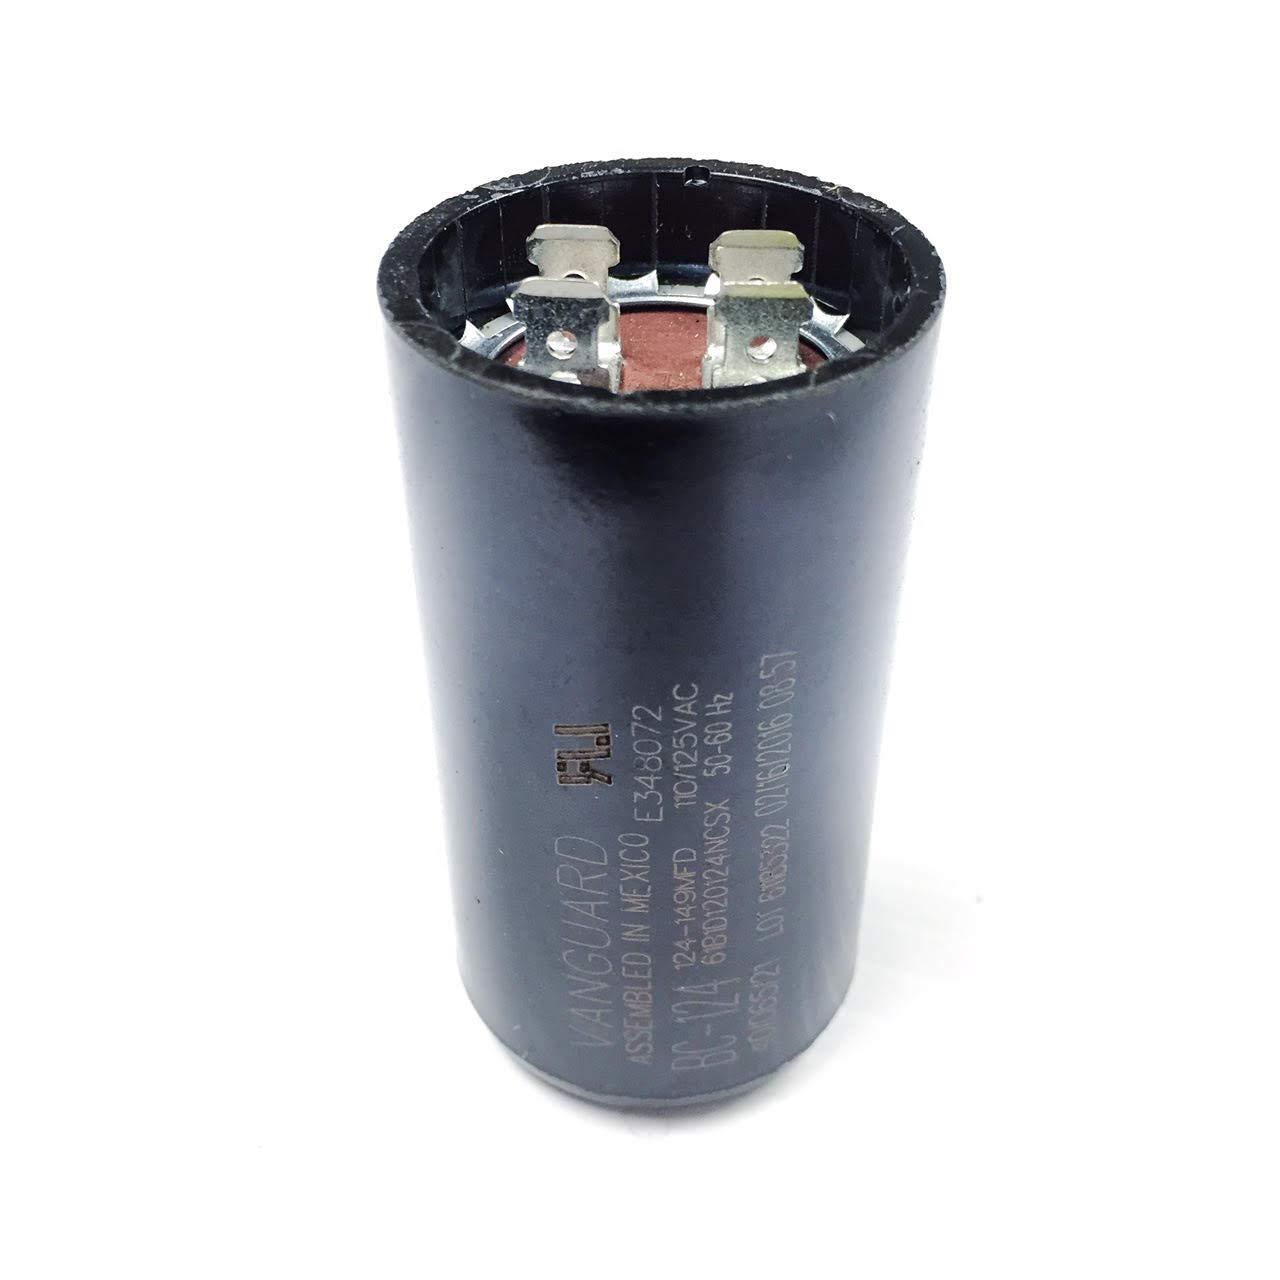 Essex Group Start Capacitor 124 149 Mfd 125vac 1 7 16 Swimming Pool Hayward Pump Wiring Diagram 16dia X 2 3 4hgt Bc Home Improvement